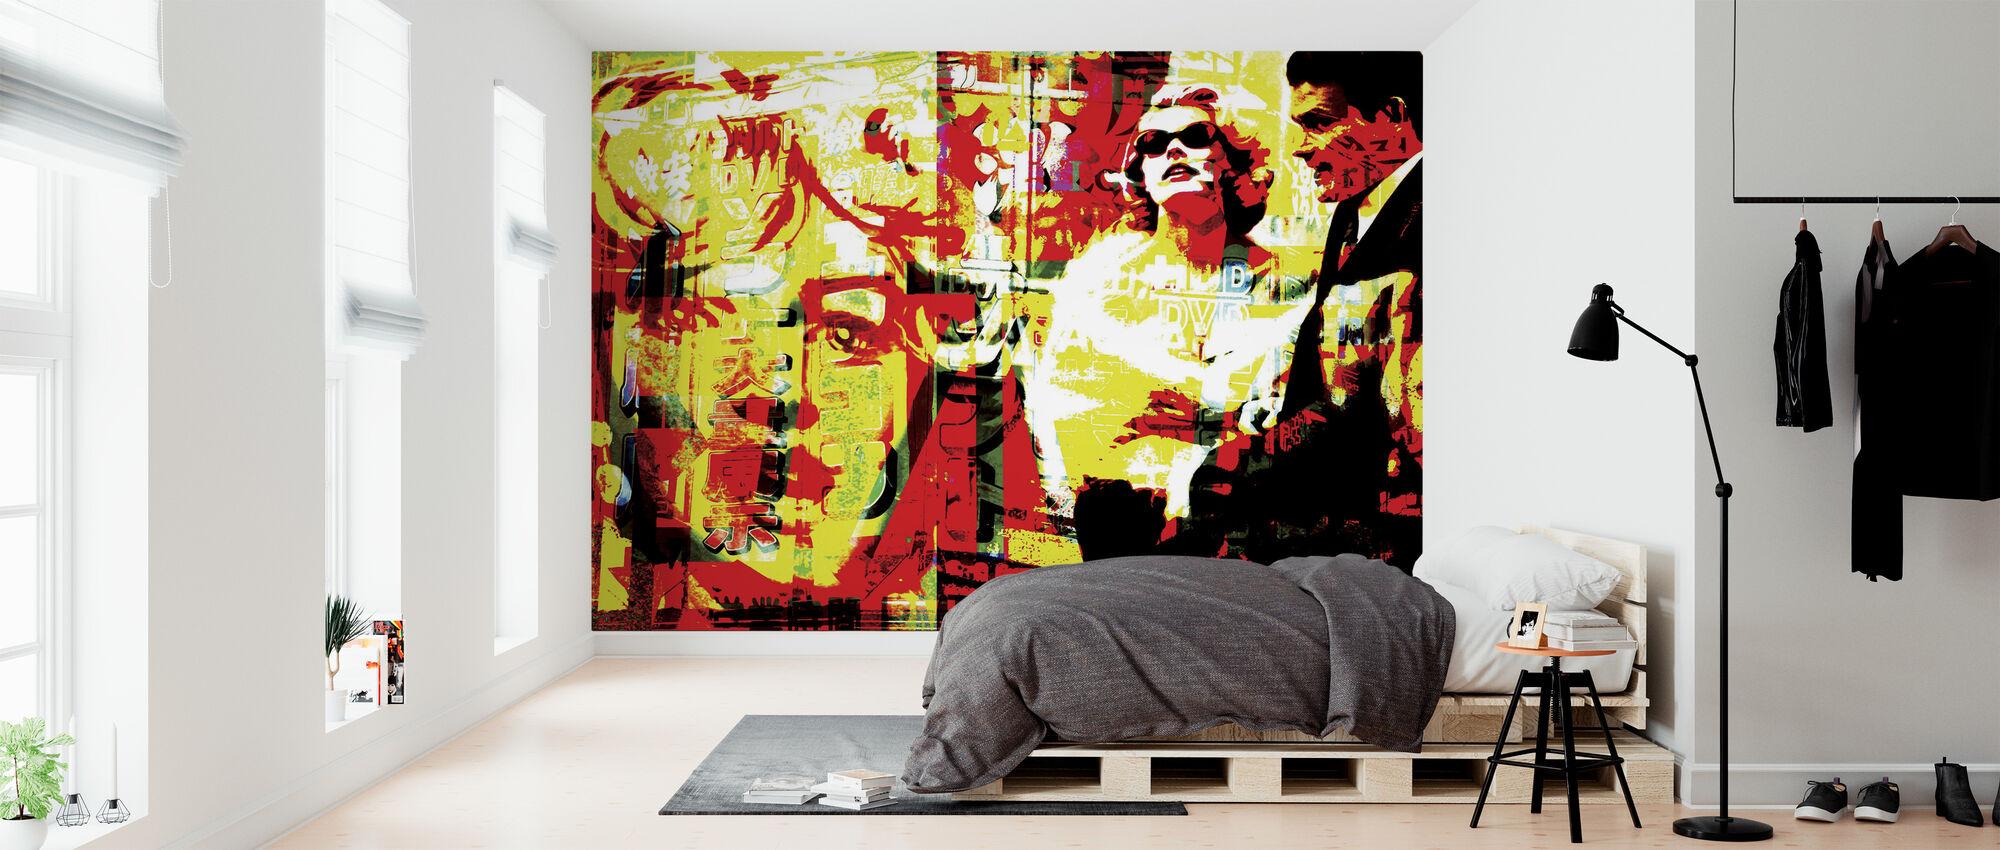 Marilyn-kuvake - Tapetti - Makuuhuone